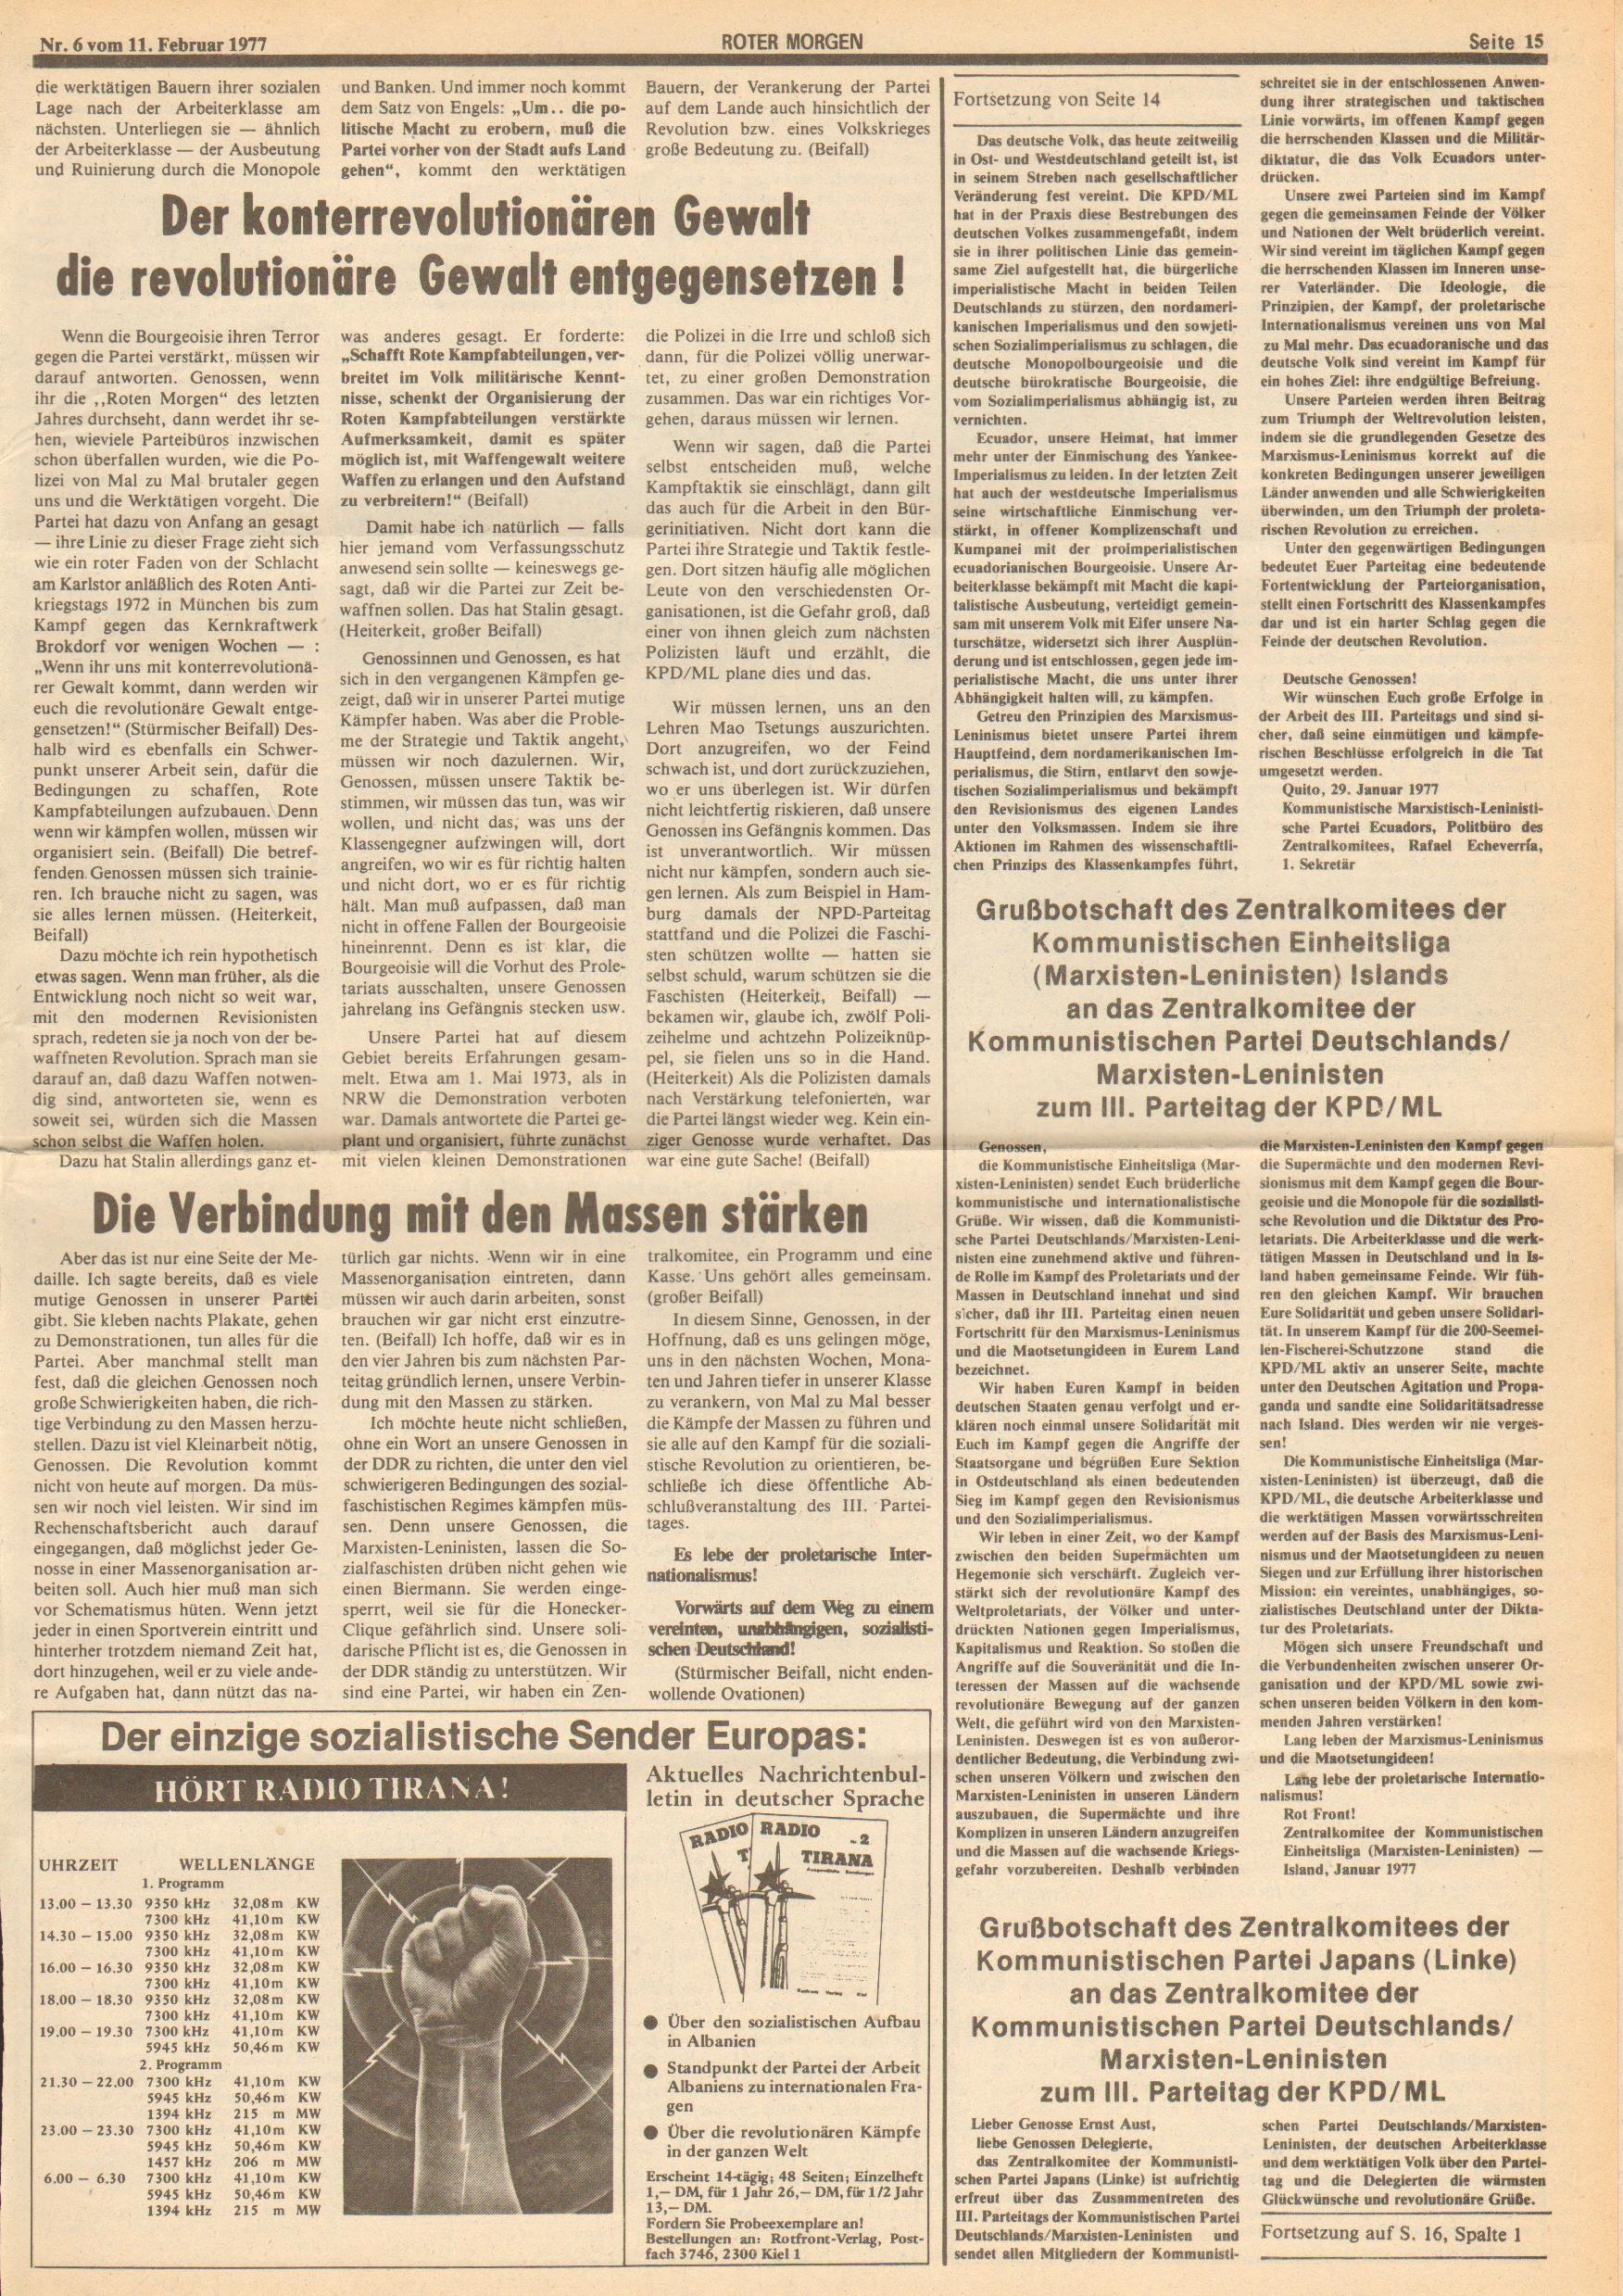 Roter Morgen, 11. Jg., 11. Februar 1977, Nr. 6, Seite 15